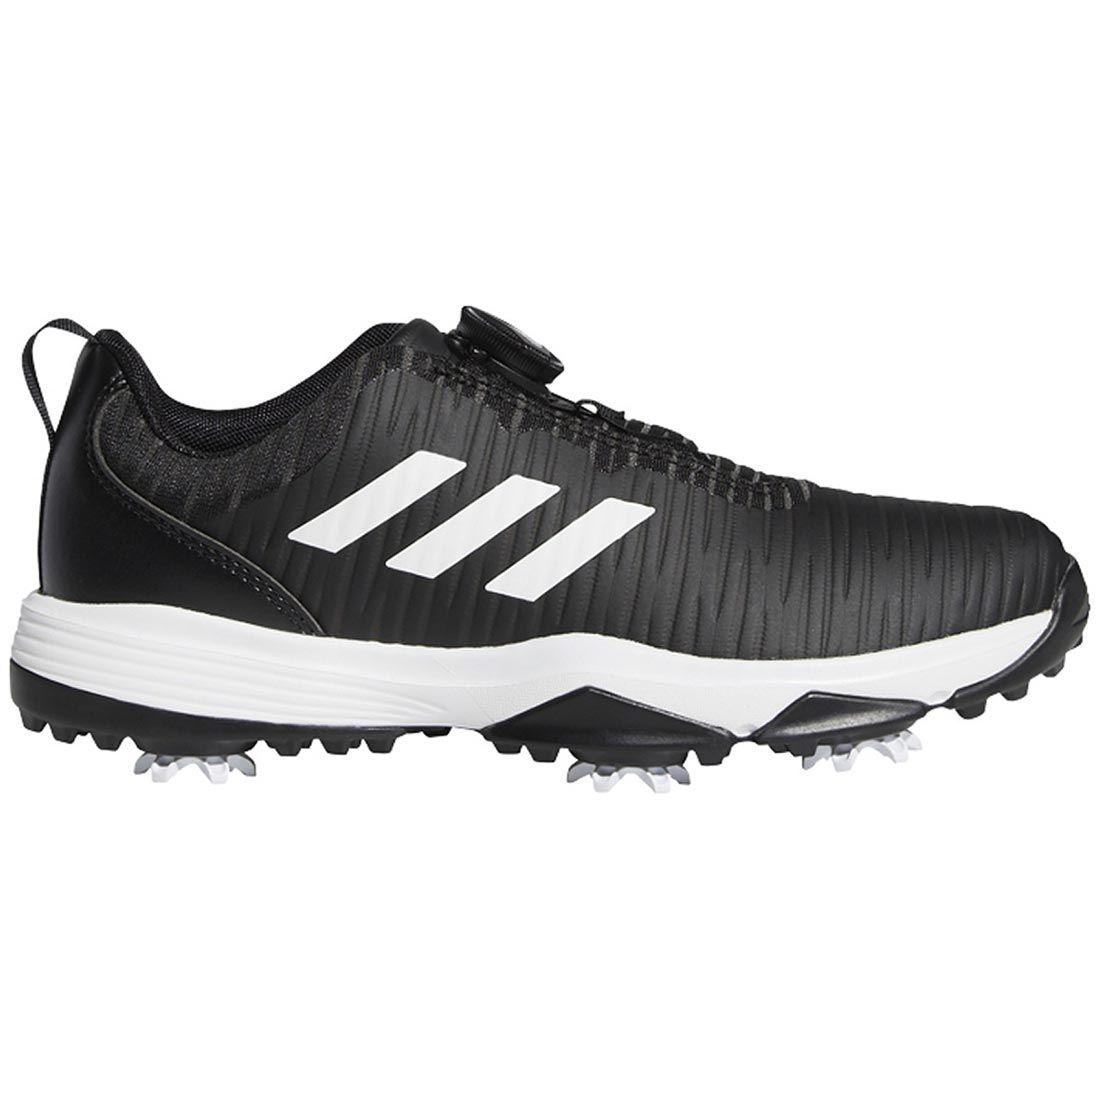 Adidas Juniors Codechaos BOA Golf Shoes Black/White/Blue